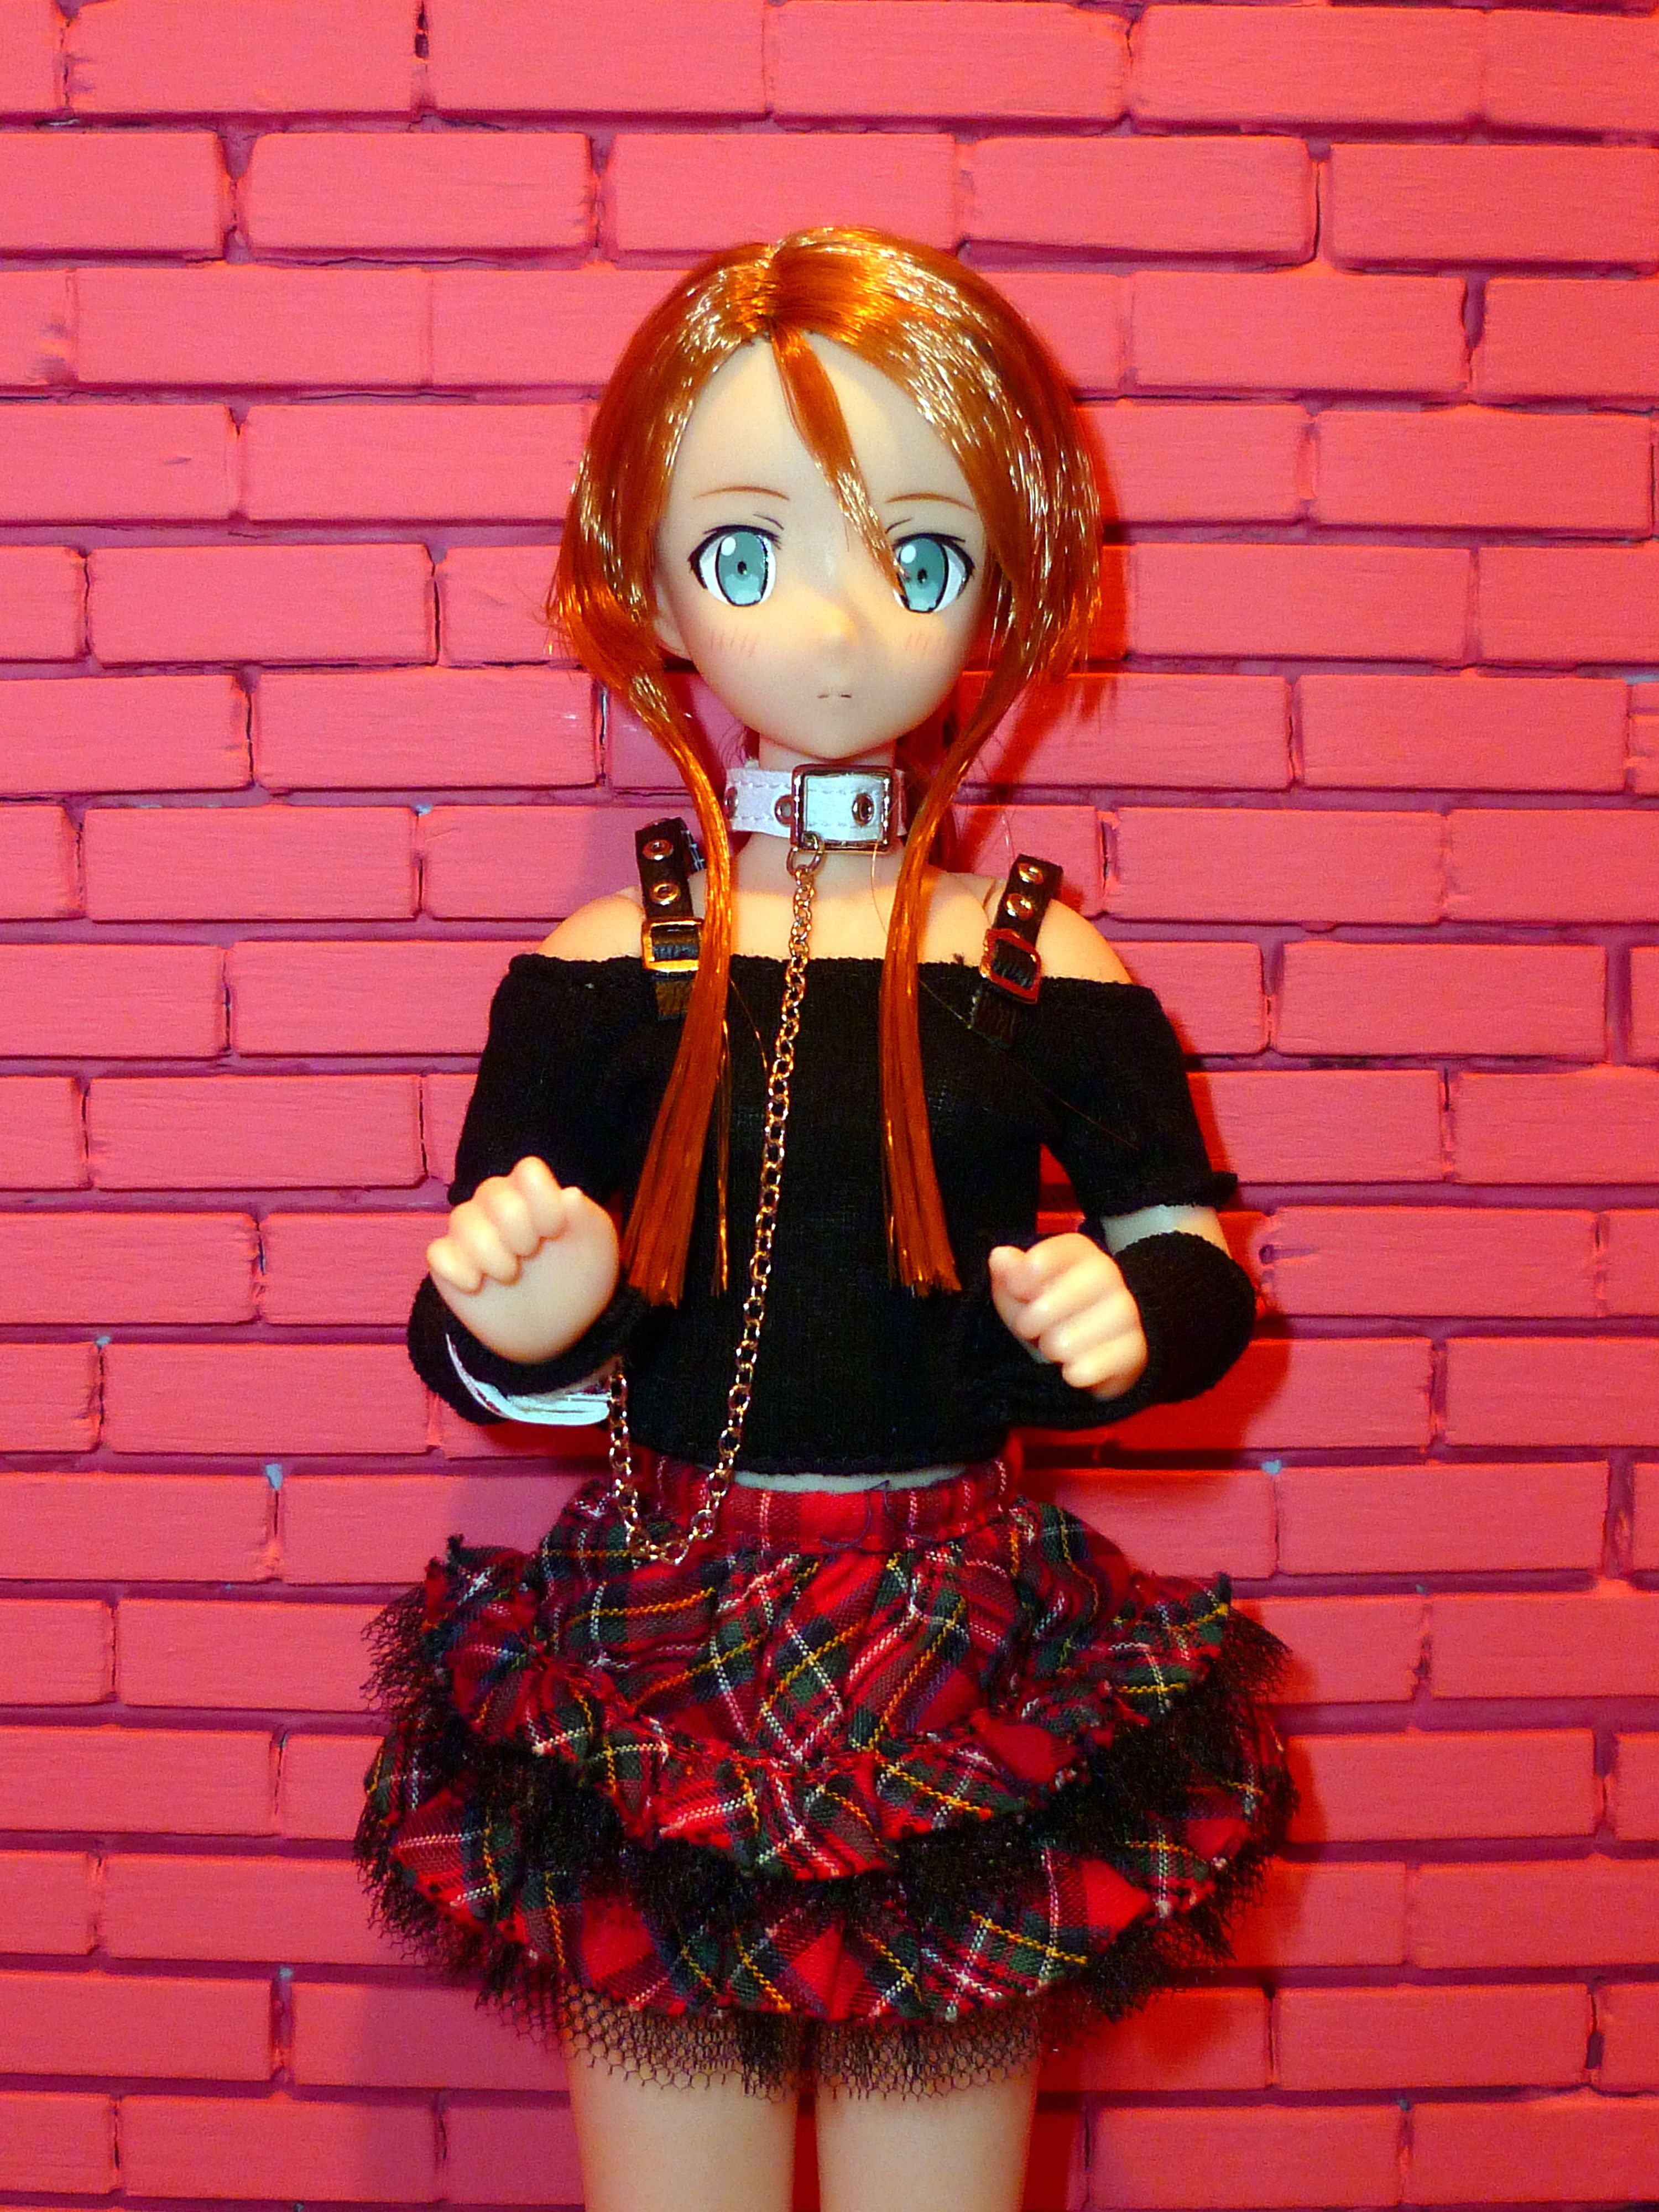 azone pureneemo doll_clothes pureneemo_m_size_costume pureneemo_s_size_costume pureneemo_wickedstyle